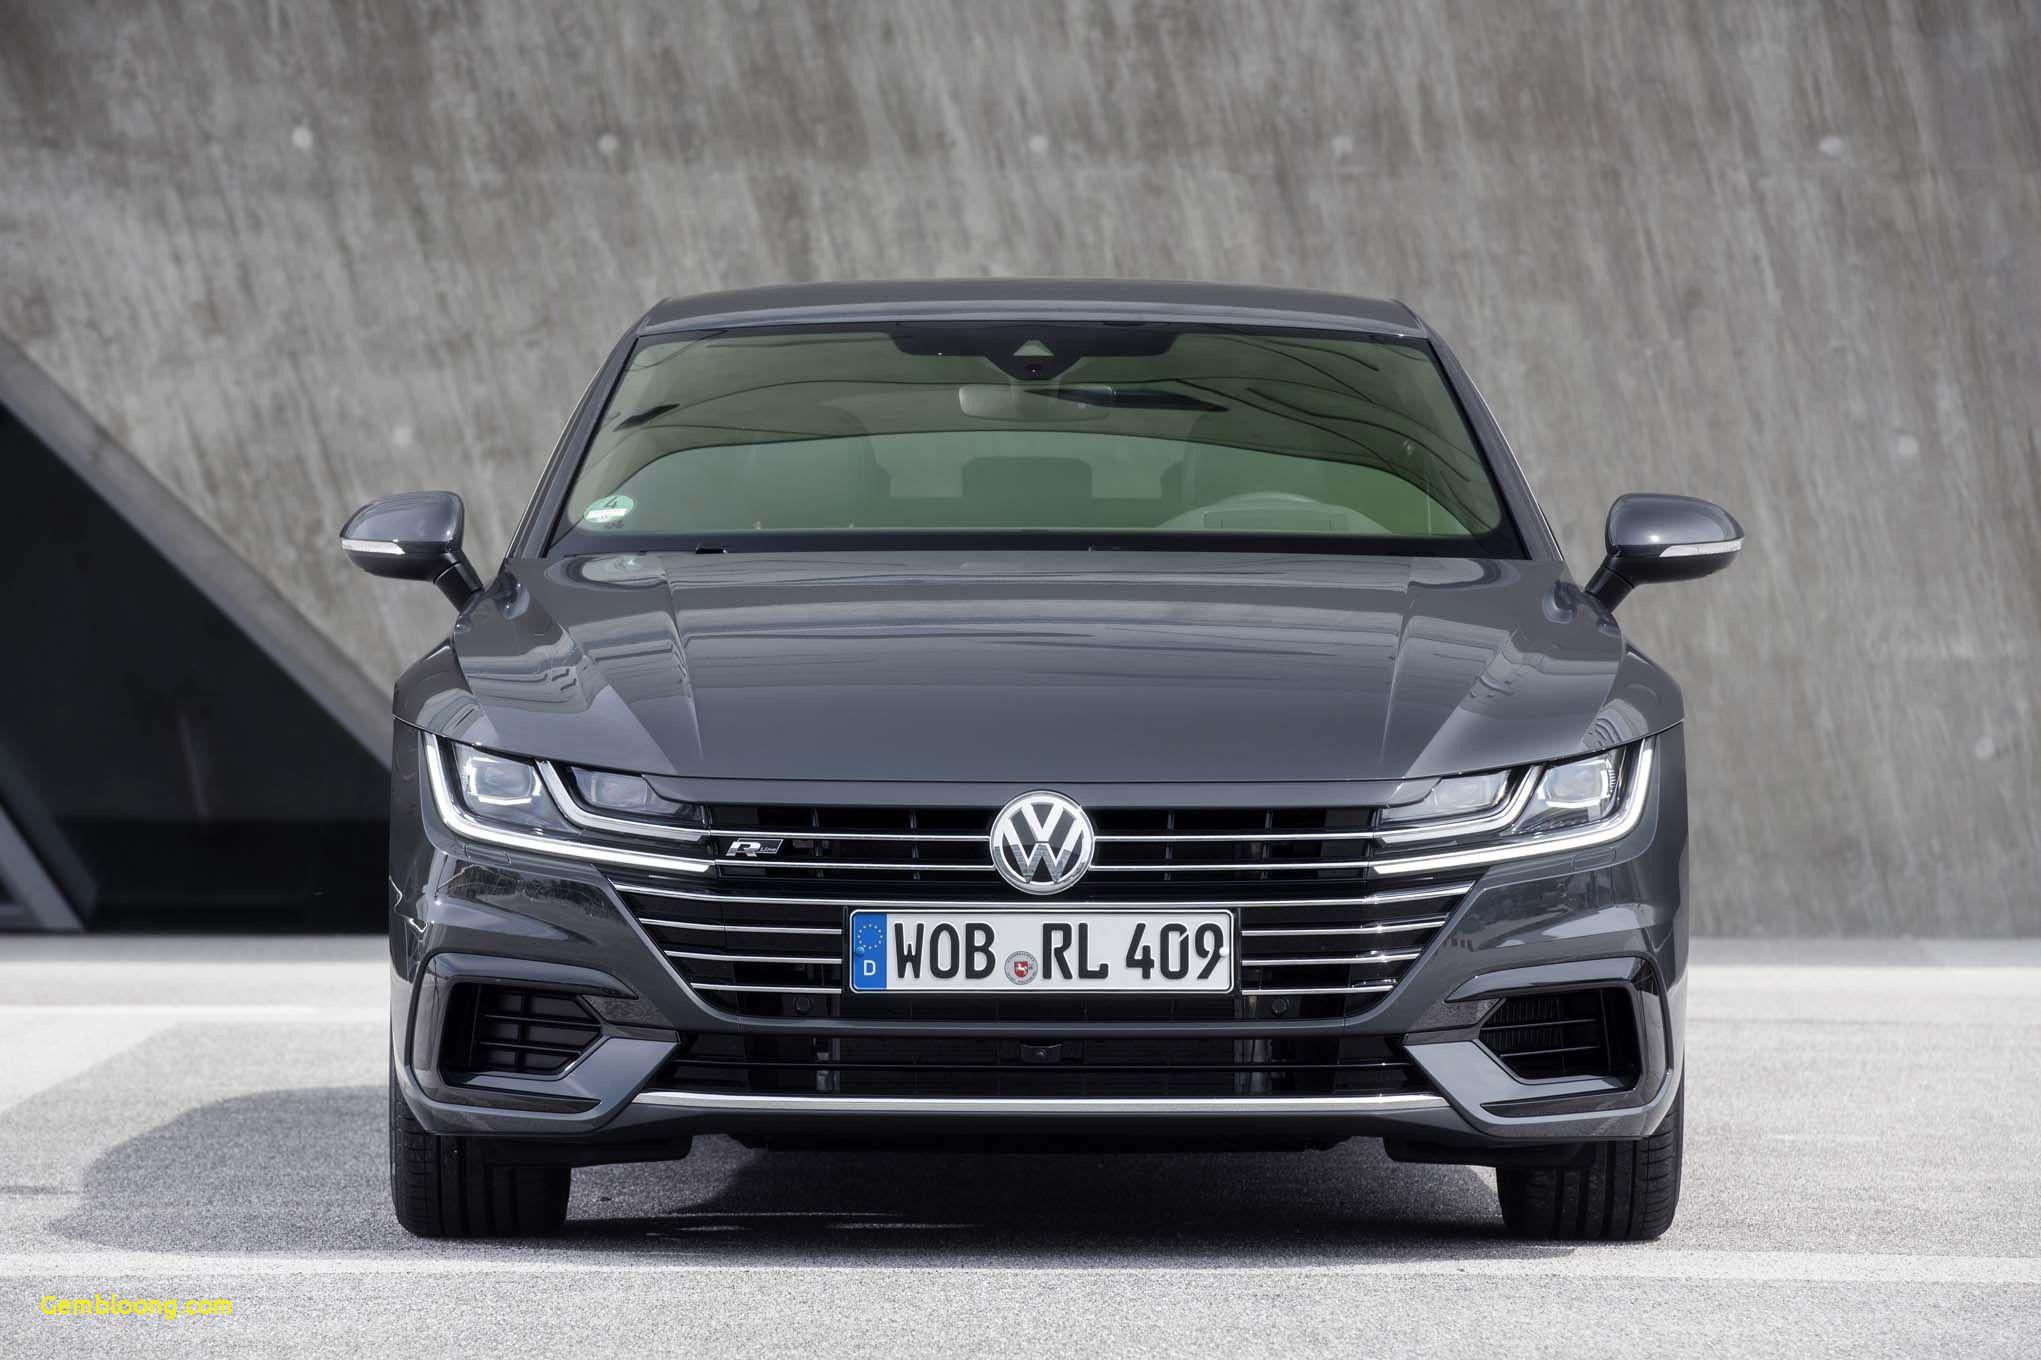 2020 Volkswagen Passat Gt Check More At Http Www Autocar1 Club 2019 05 29 2020 Volkswagen Passat Gt Volkswagen Passat Cc Volkswagen Cc Volkswagen